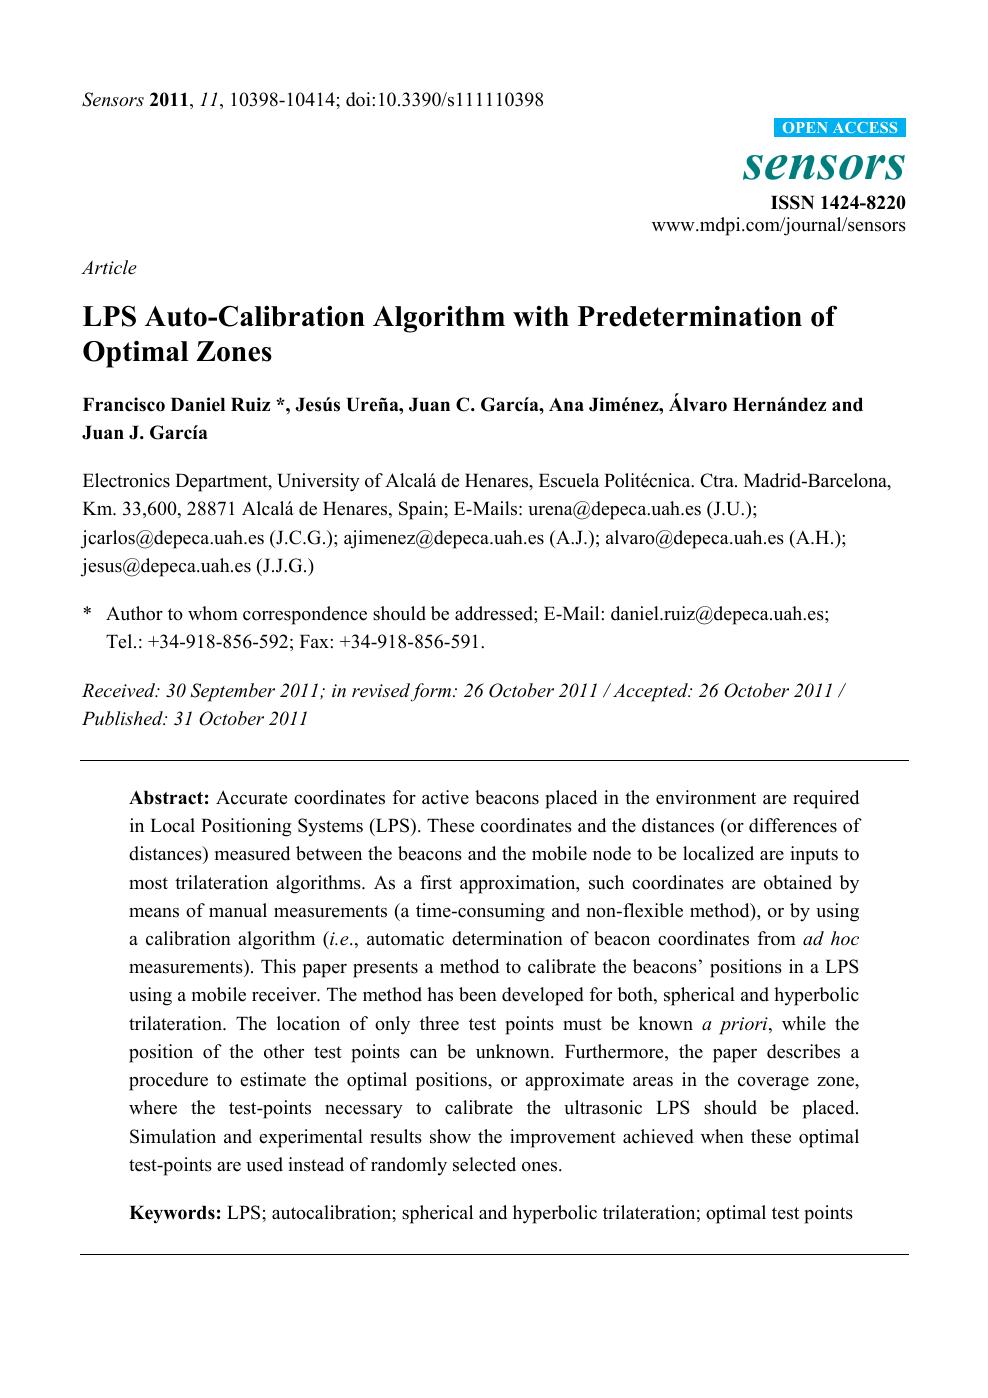 LPS Auto-Calibration Algorithm with Predetermination of